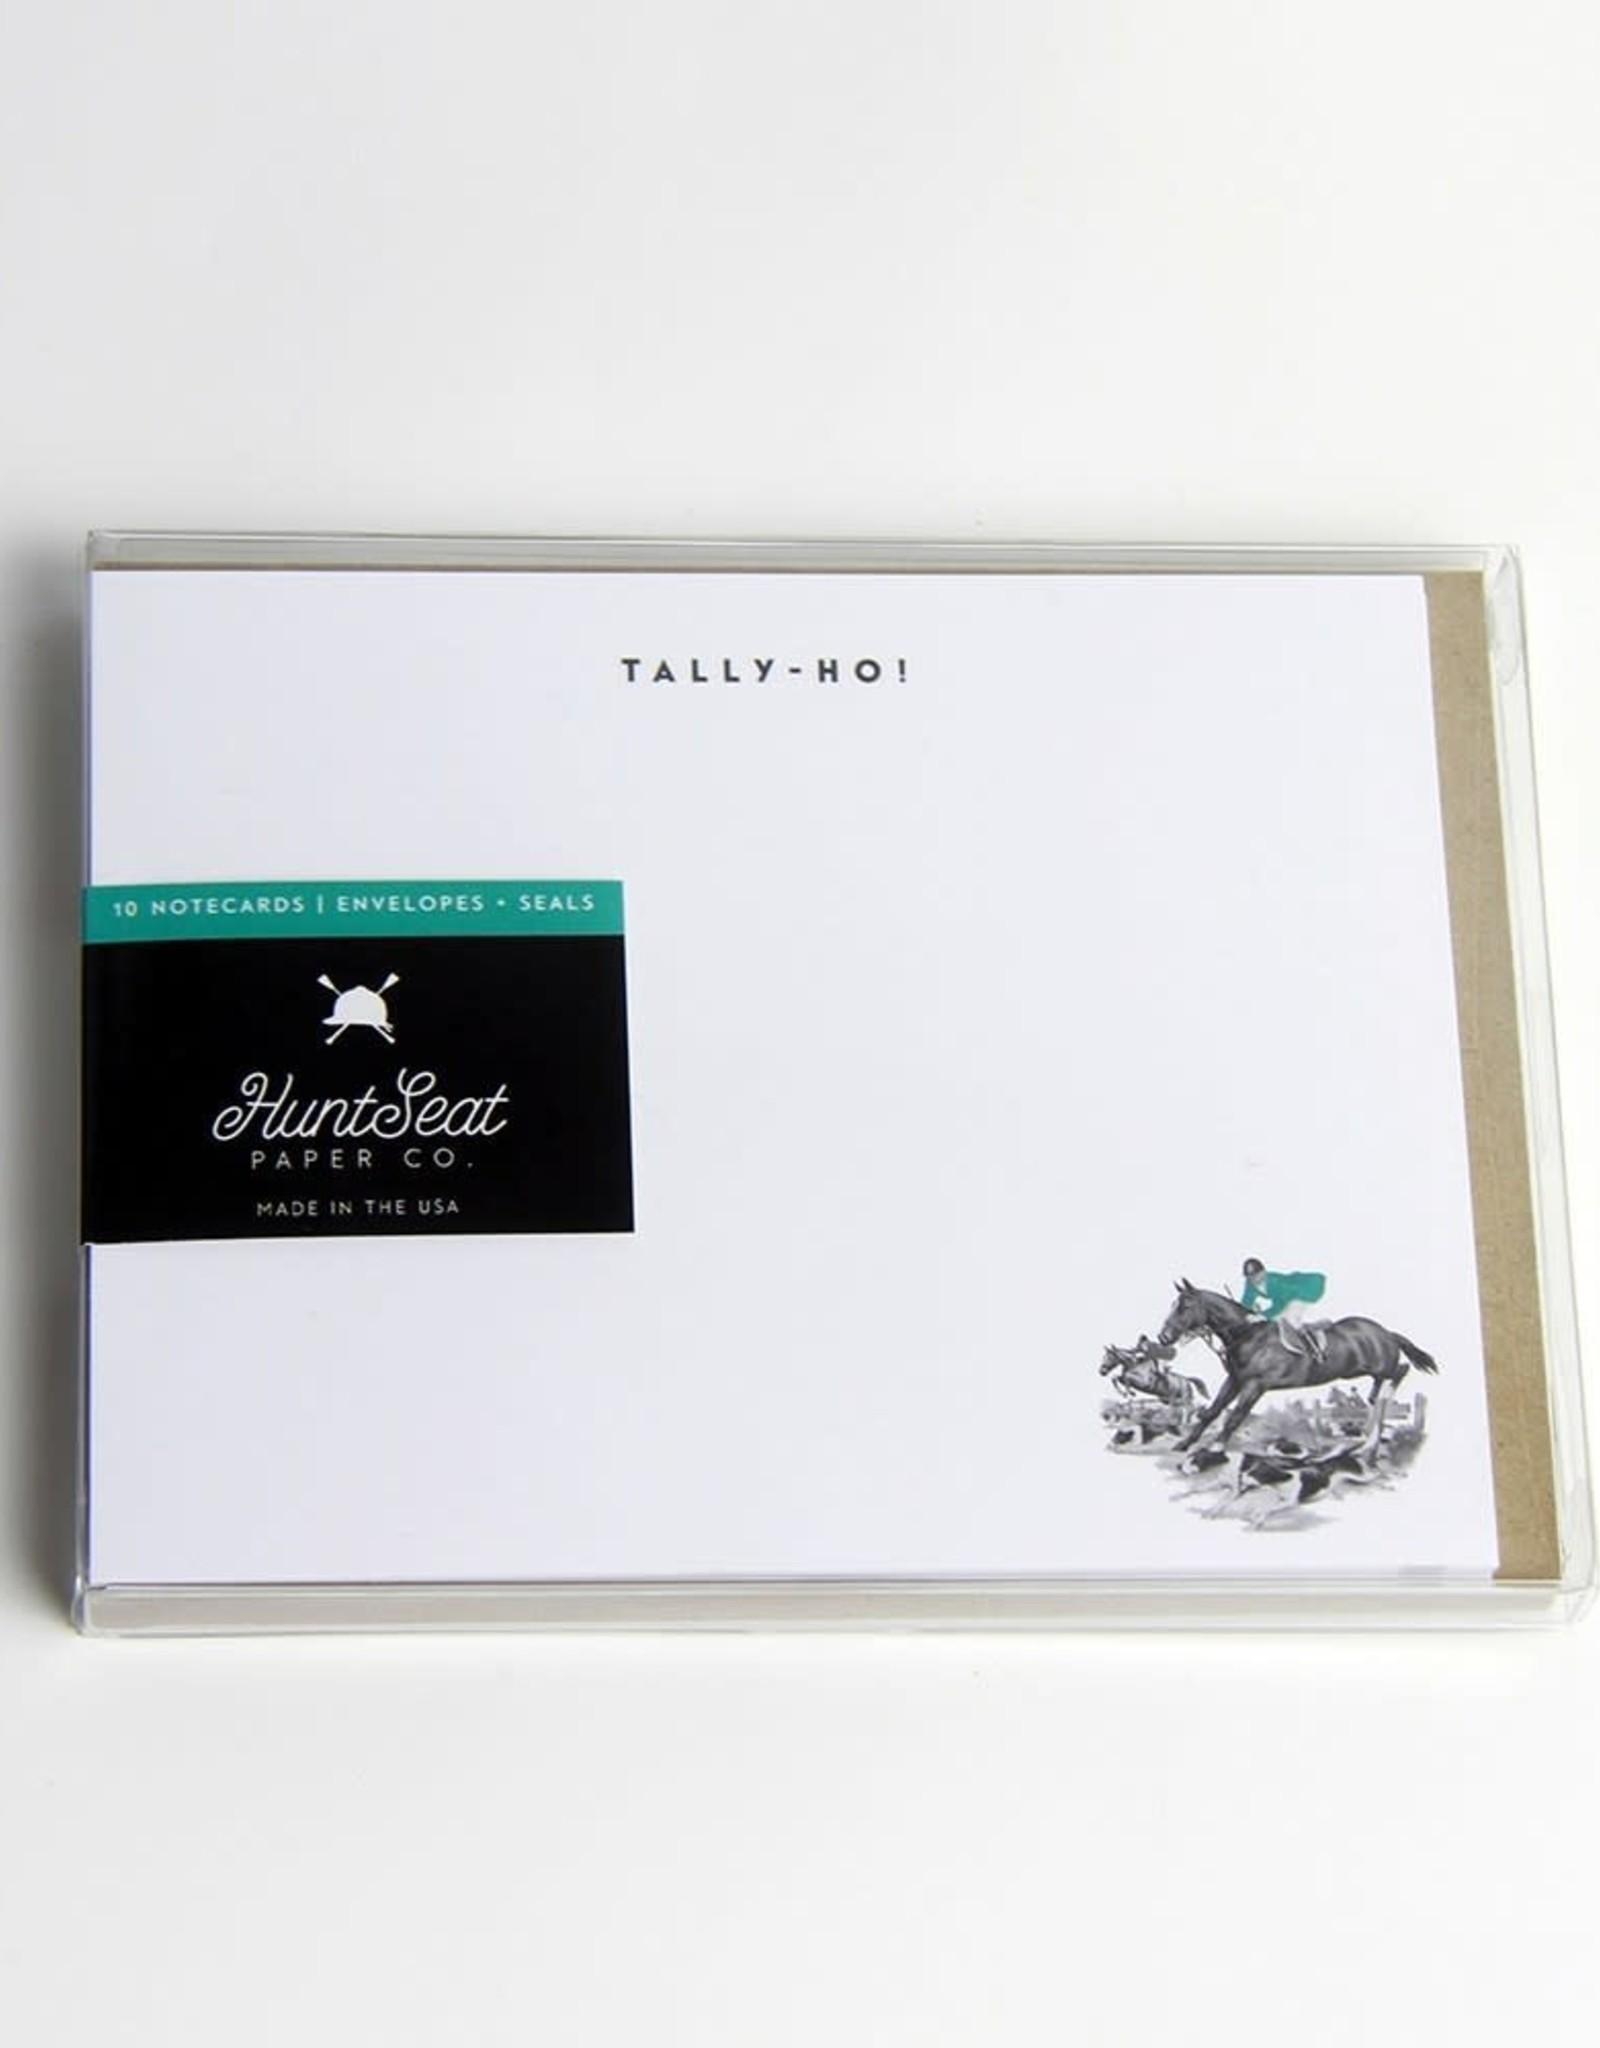 HUNTSEAT PAPER CO. NOTECARD BOX SET